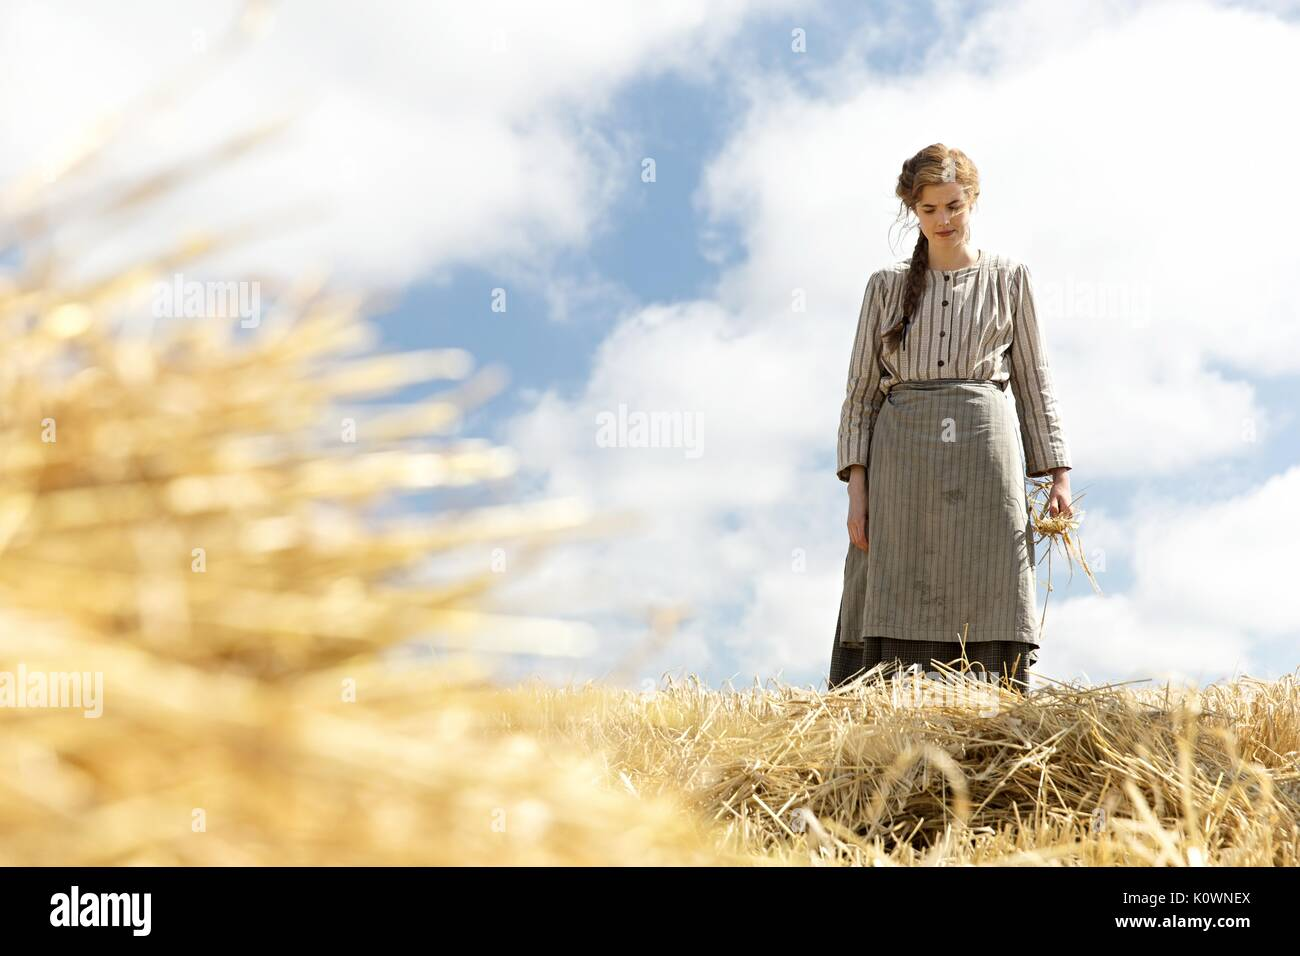 AGYNESS DEYN SUNSET SONG (2015) - Stock Image